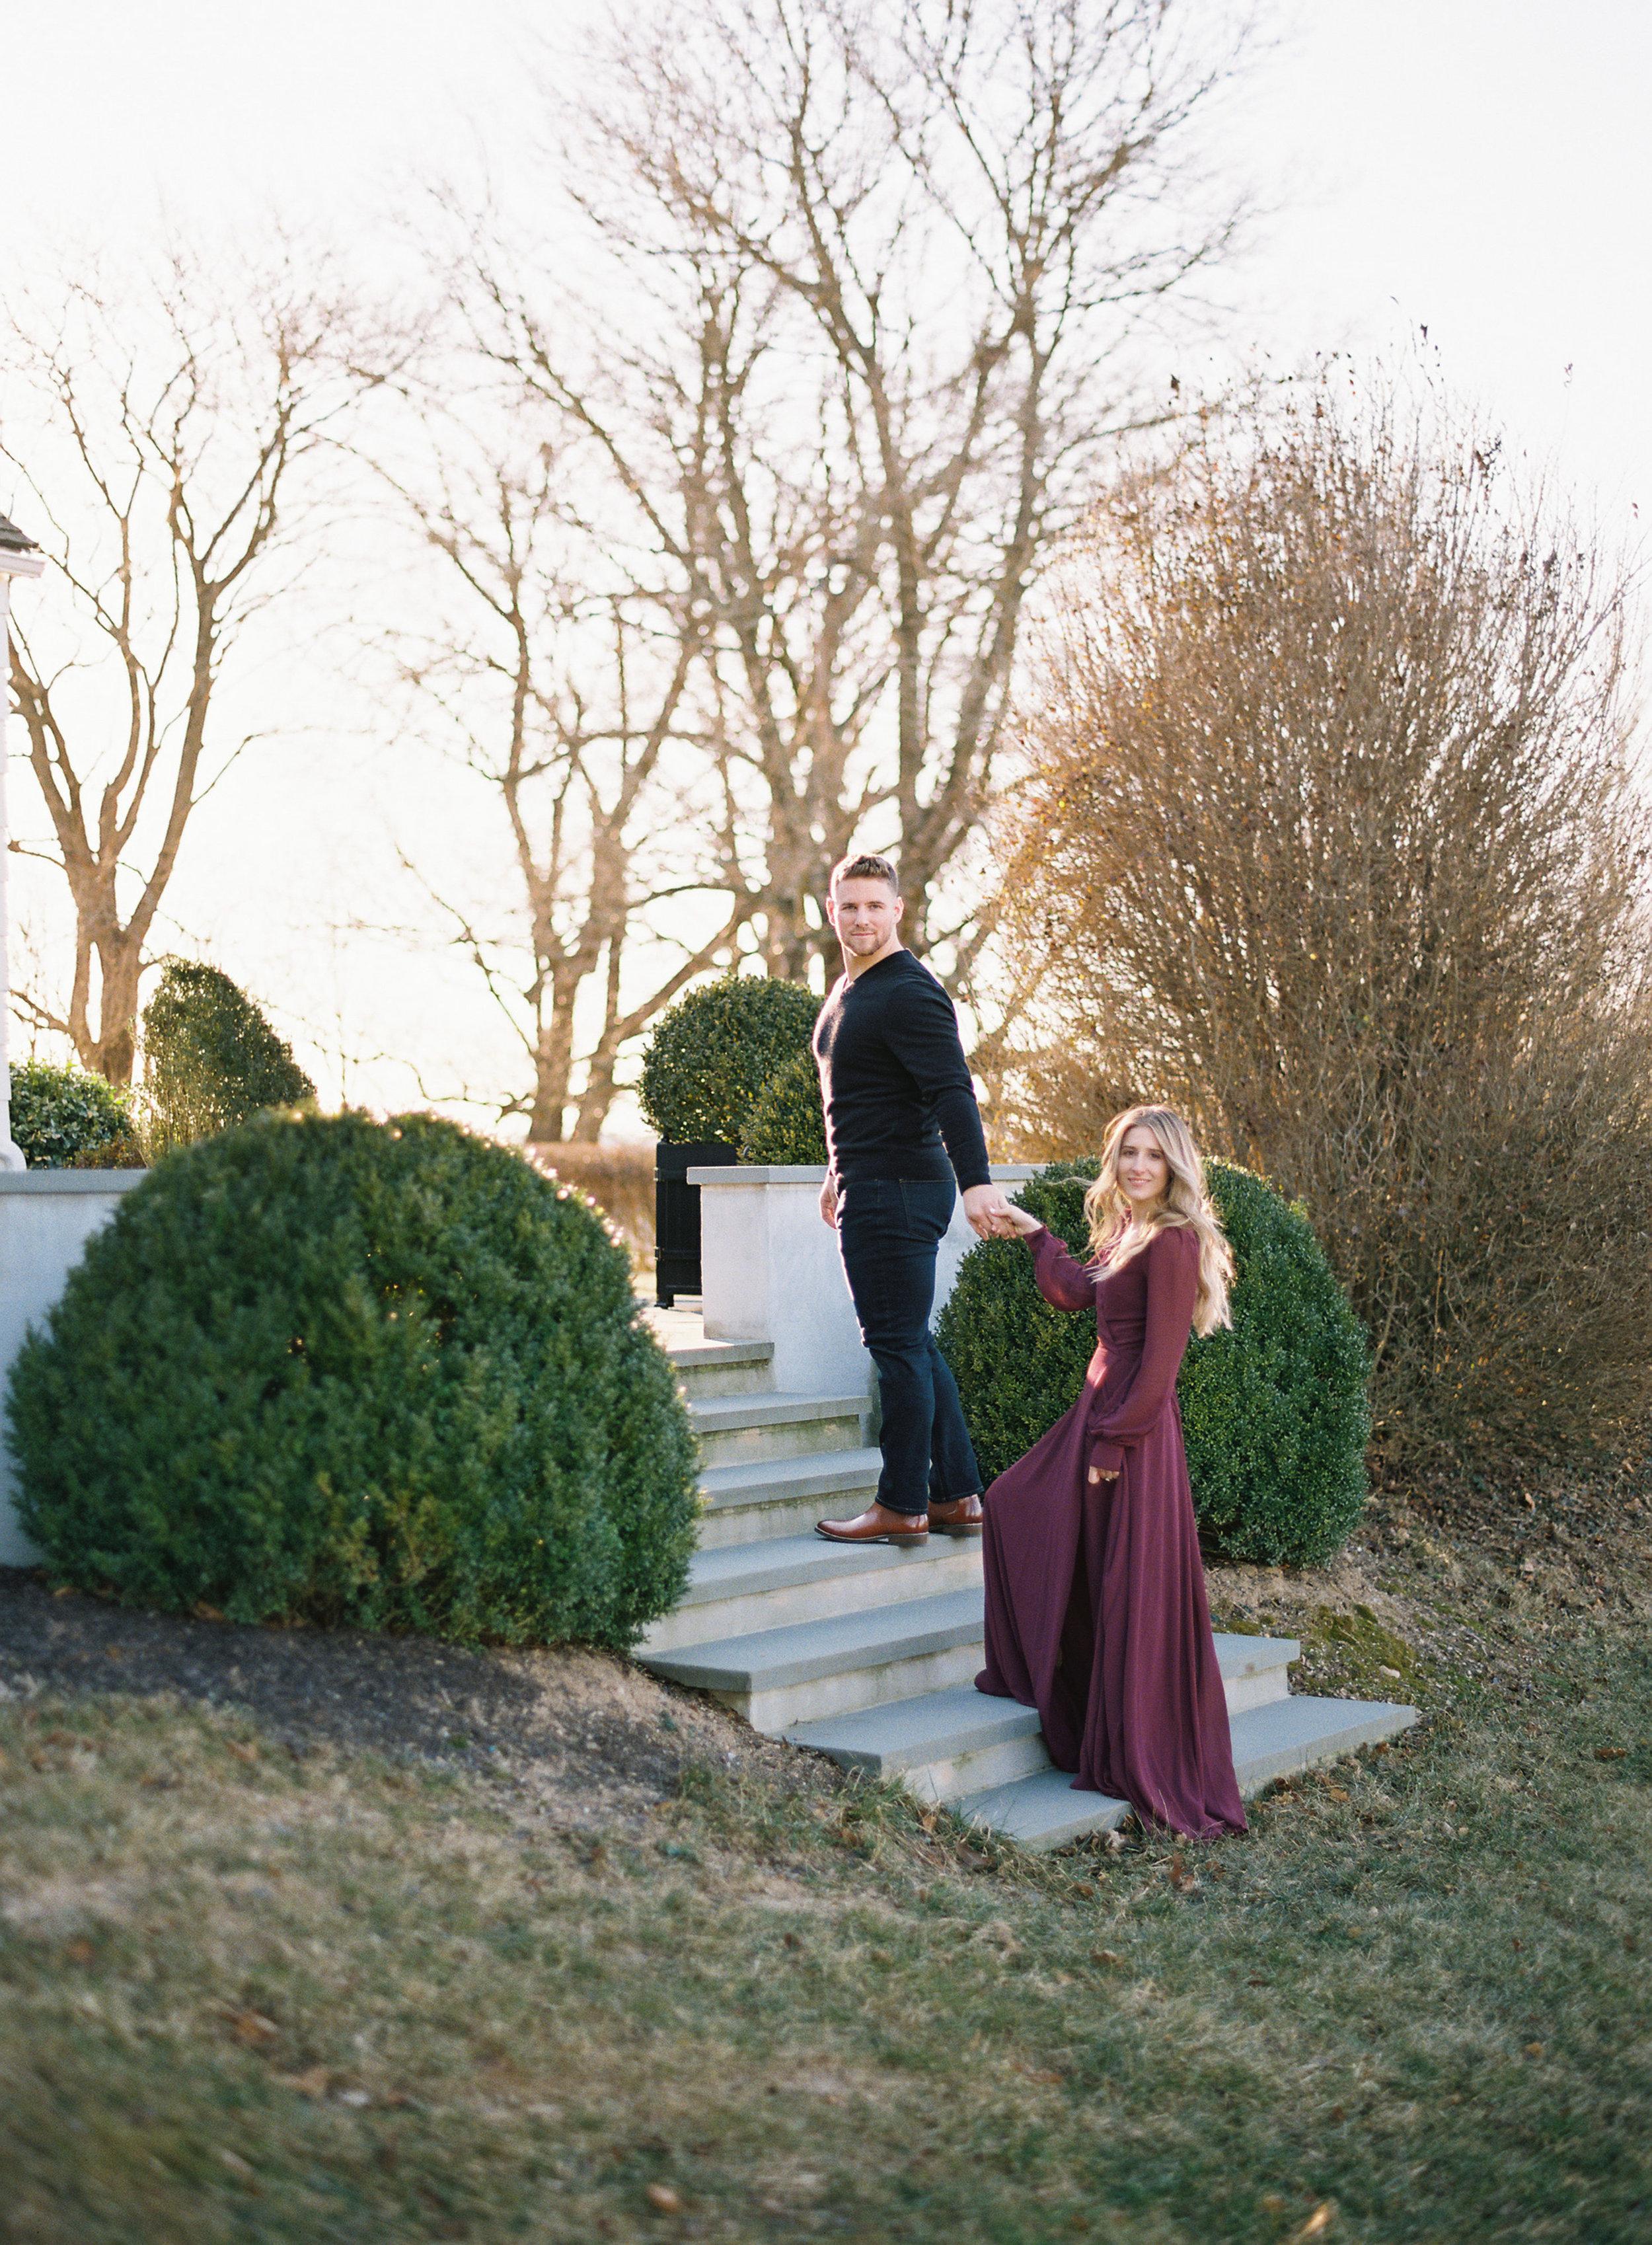 Mike & Kirsten February 2019 Engagement-0071.jpg